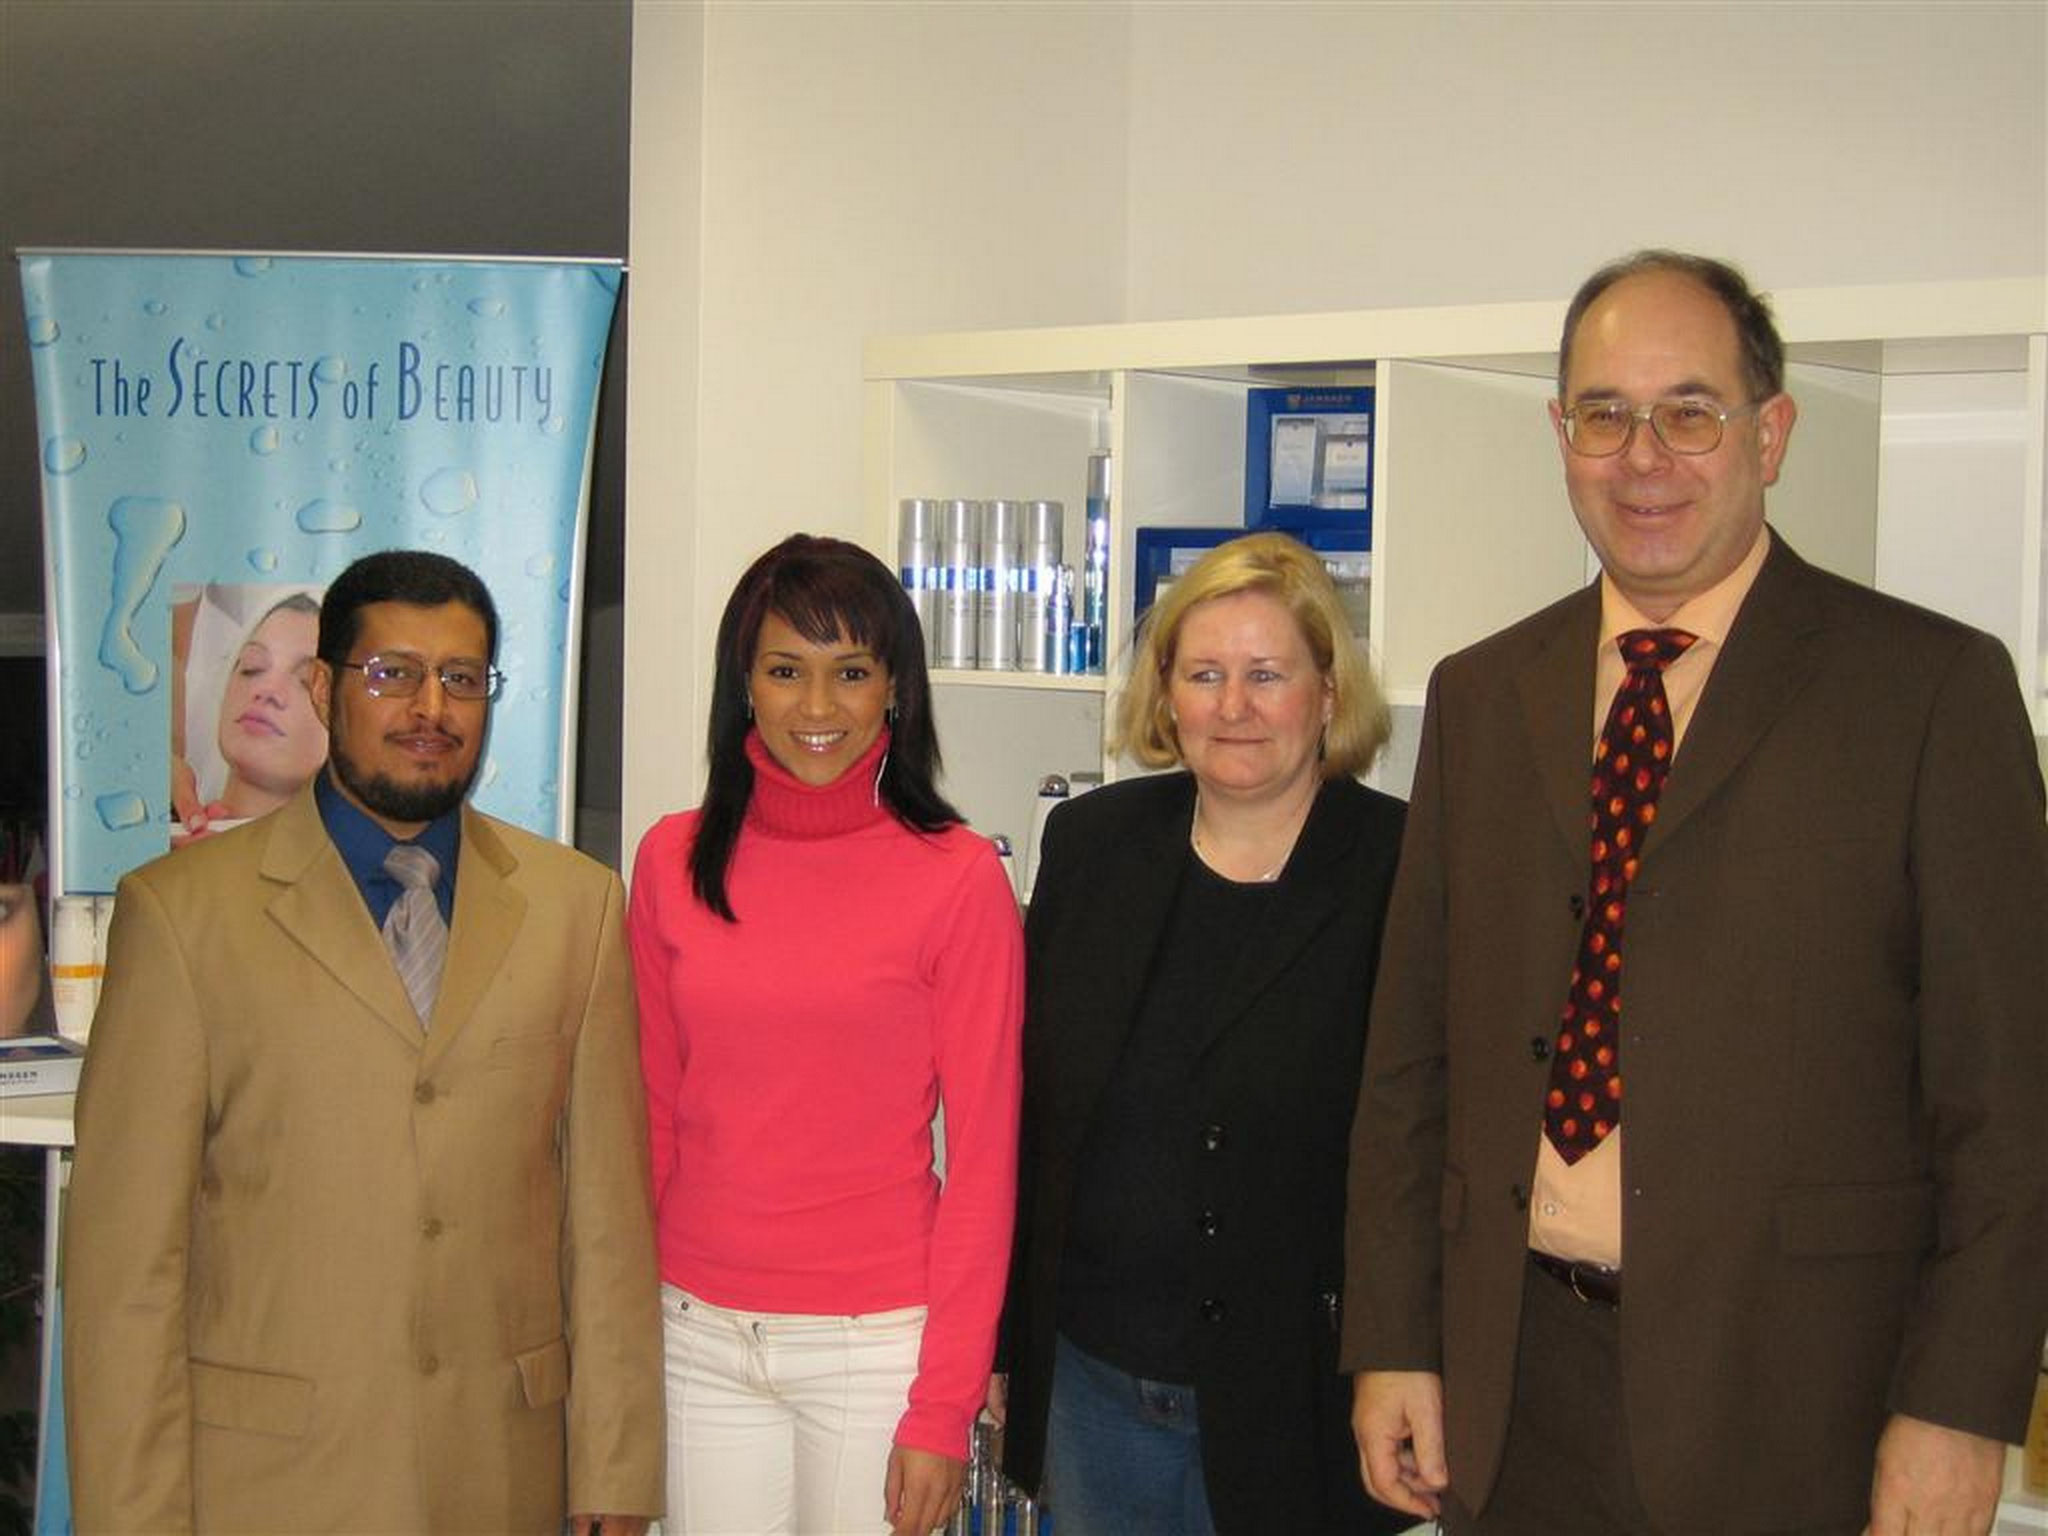 Naser al-Harbi in Aachen with Bouchra and mrs. Murmann